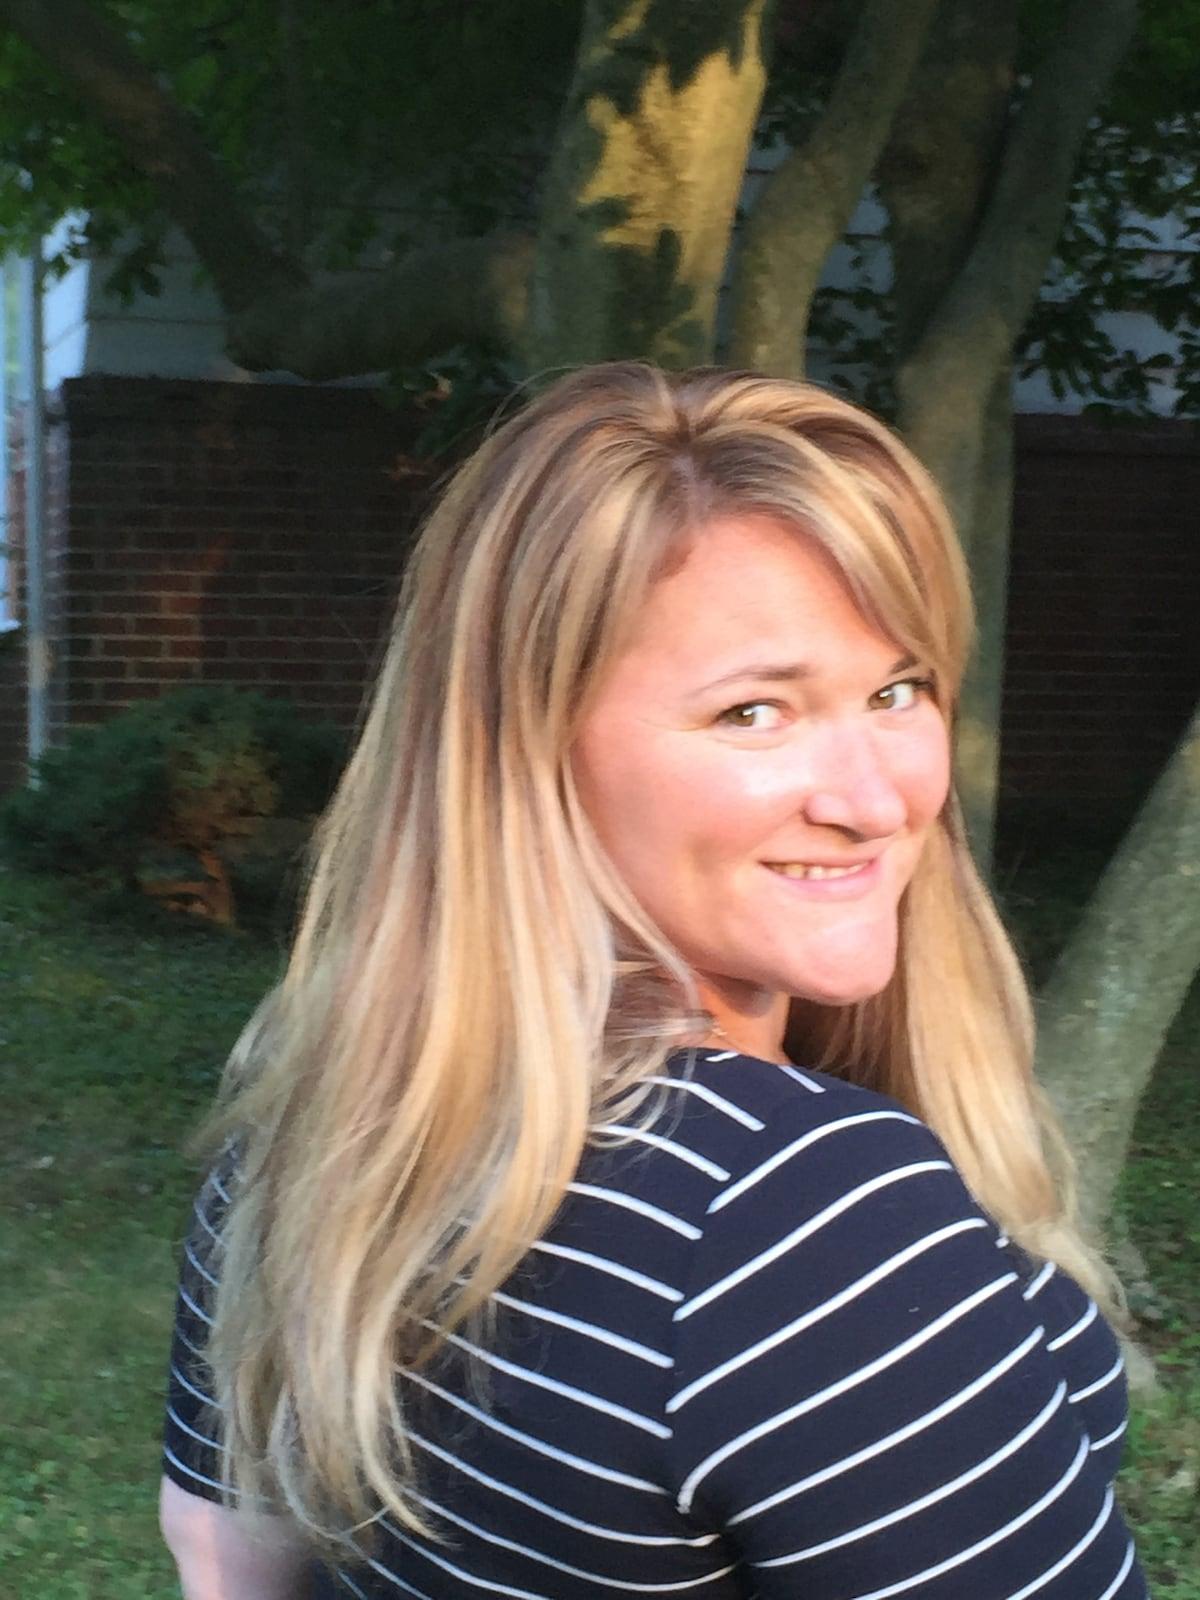 Kristen from Swarthmore